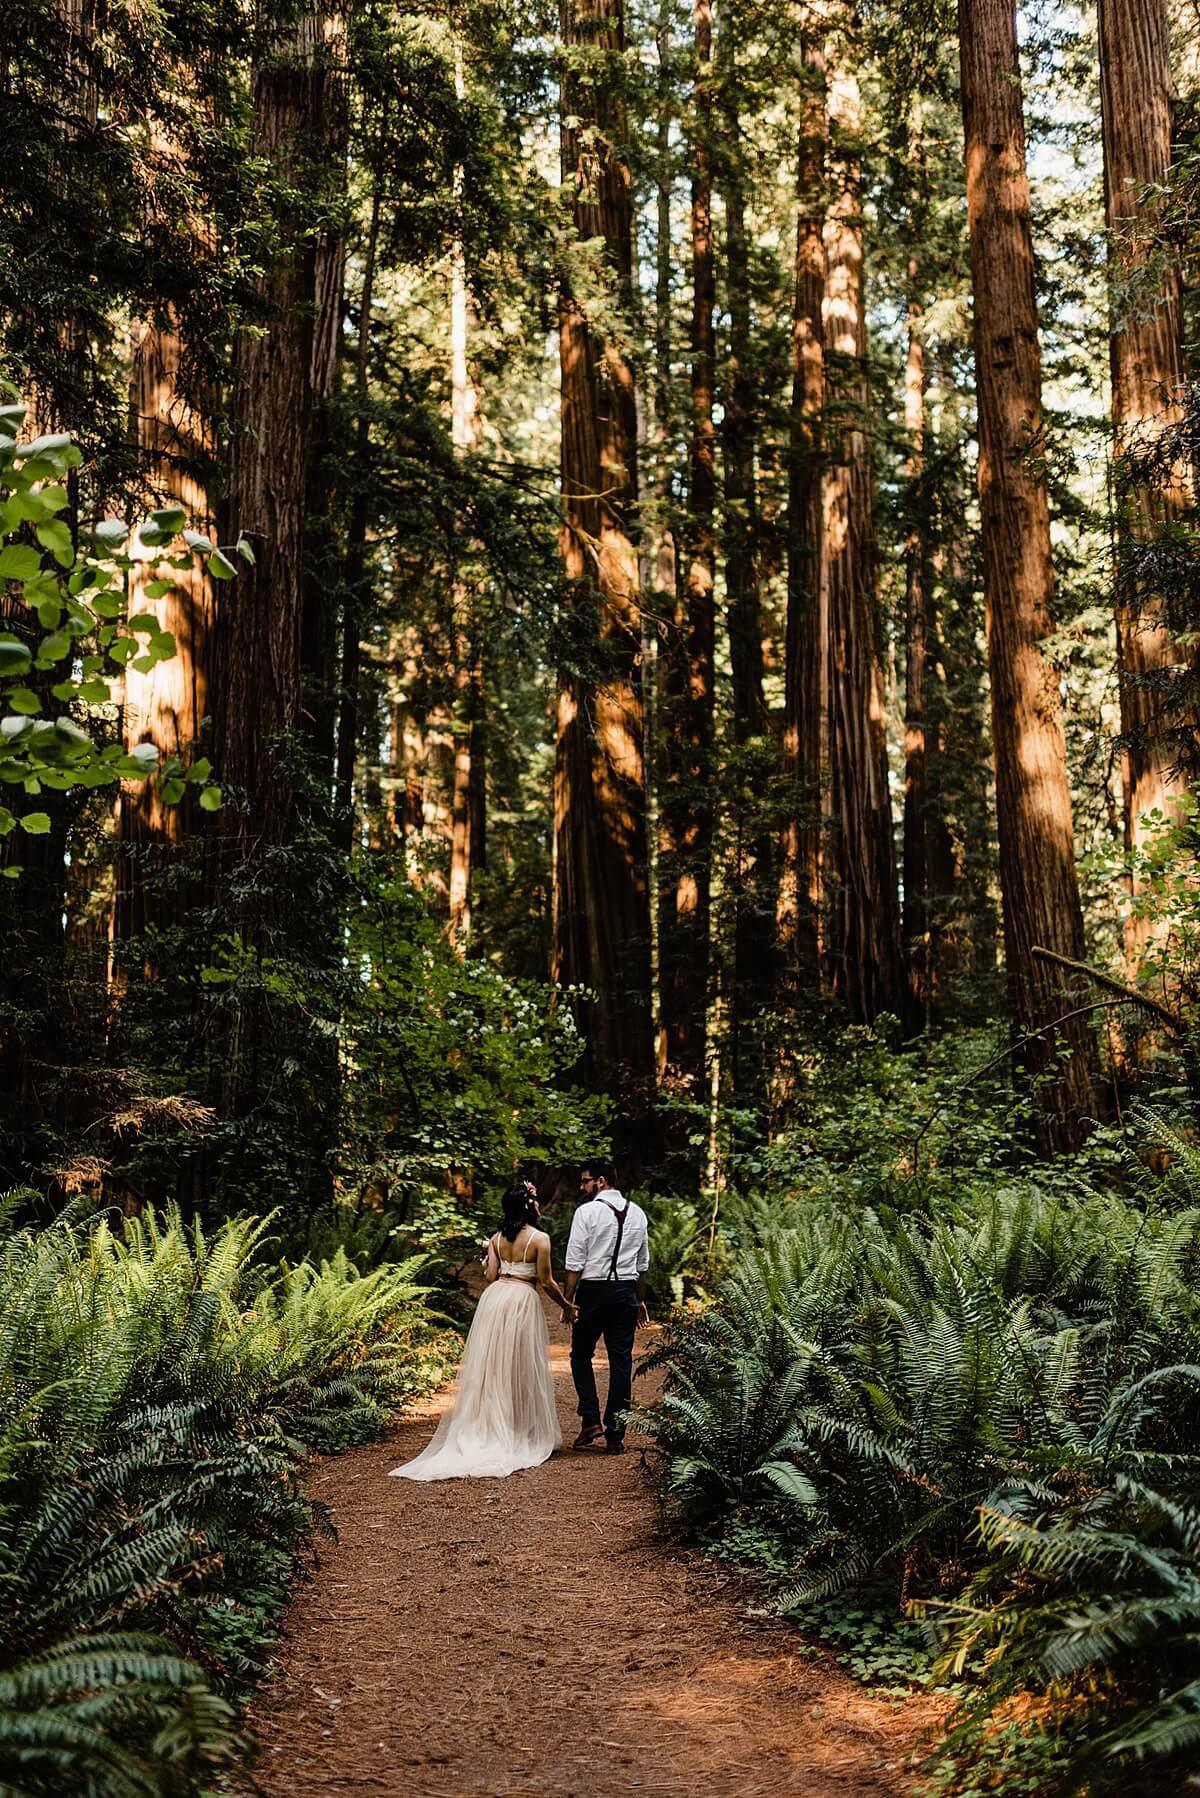 Allison-Brooks-Jedediah-Smiith-Redwoods-Adventure-Elopement-Wedding-S-Photography-Blog_0031.jpg